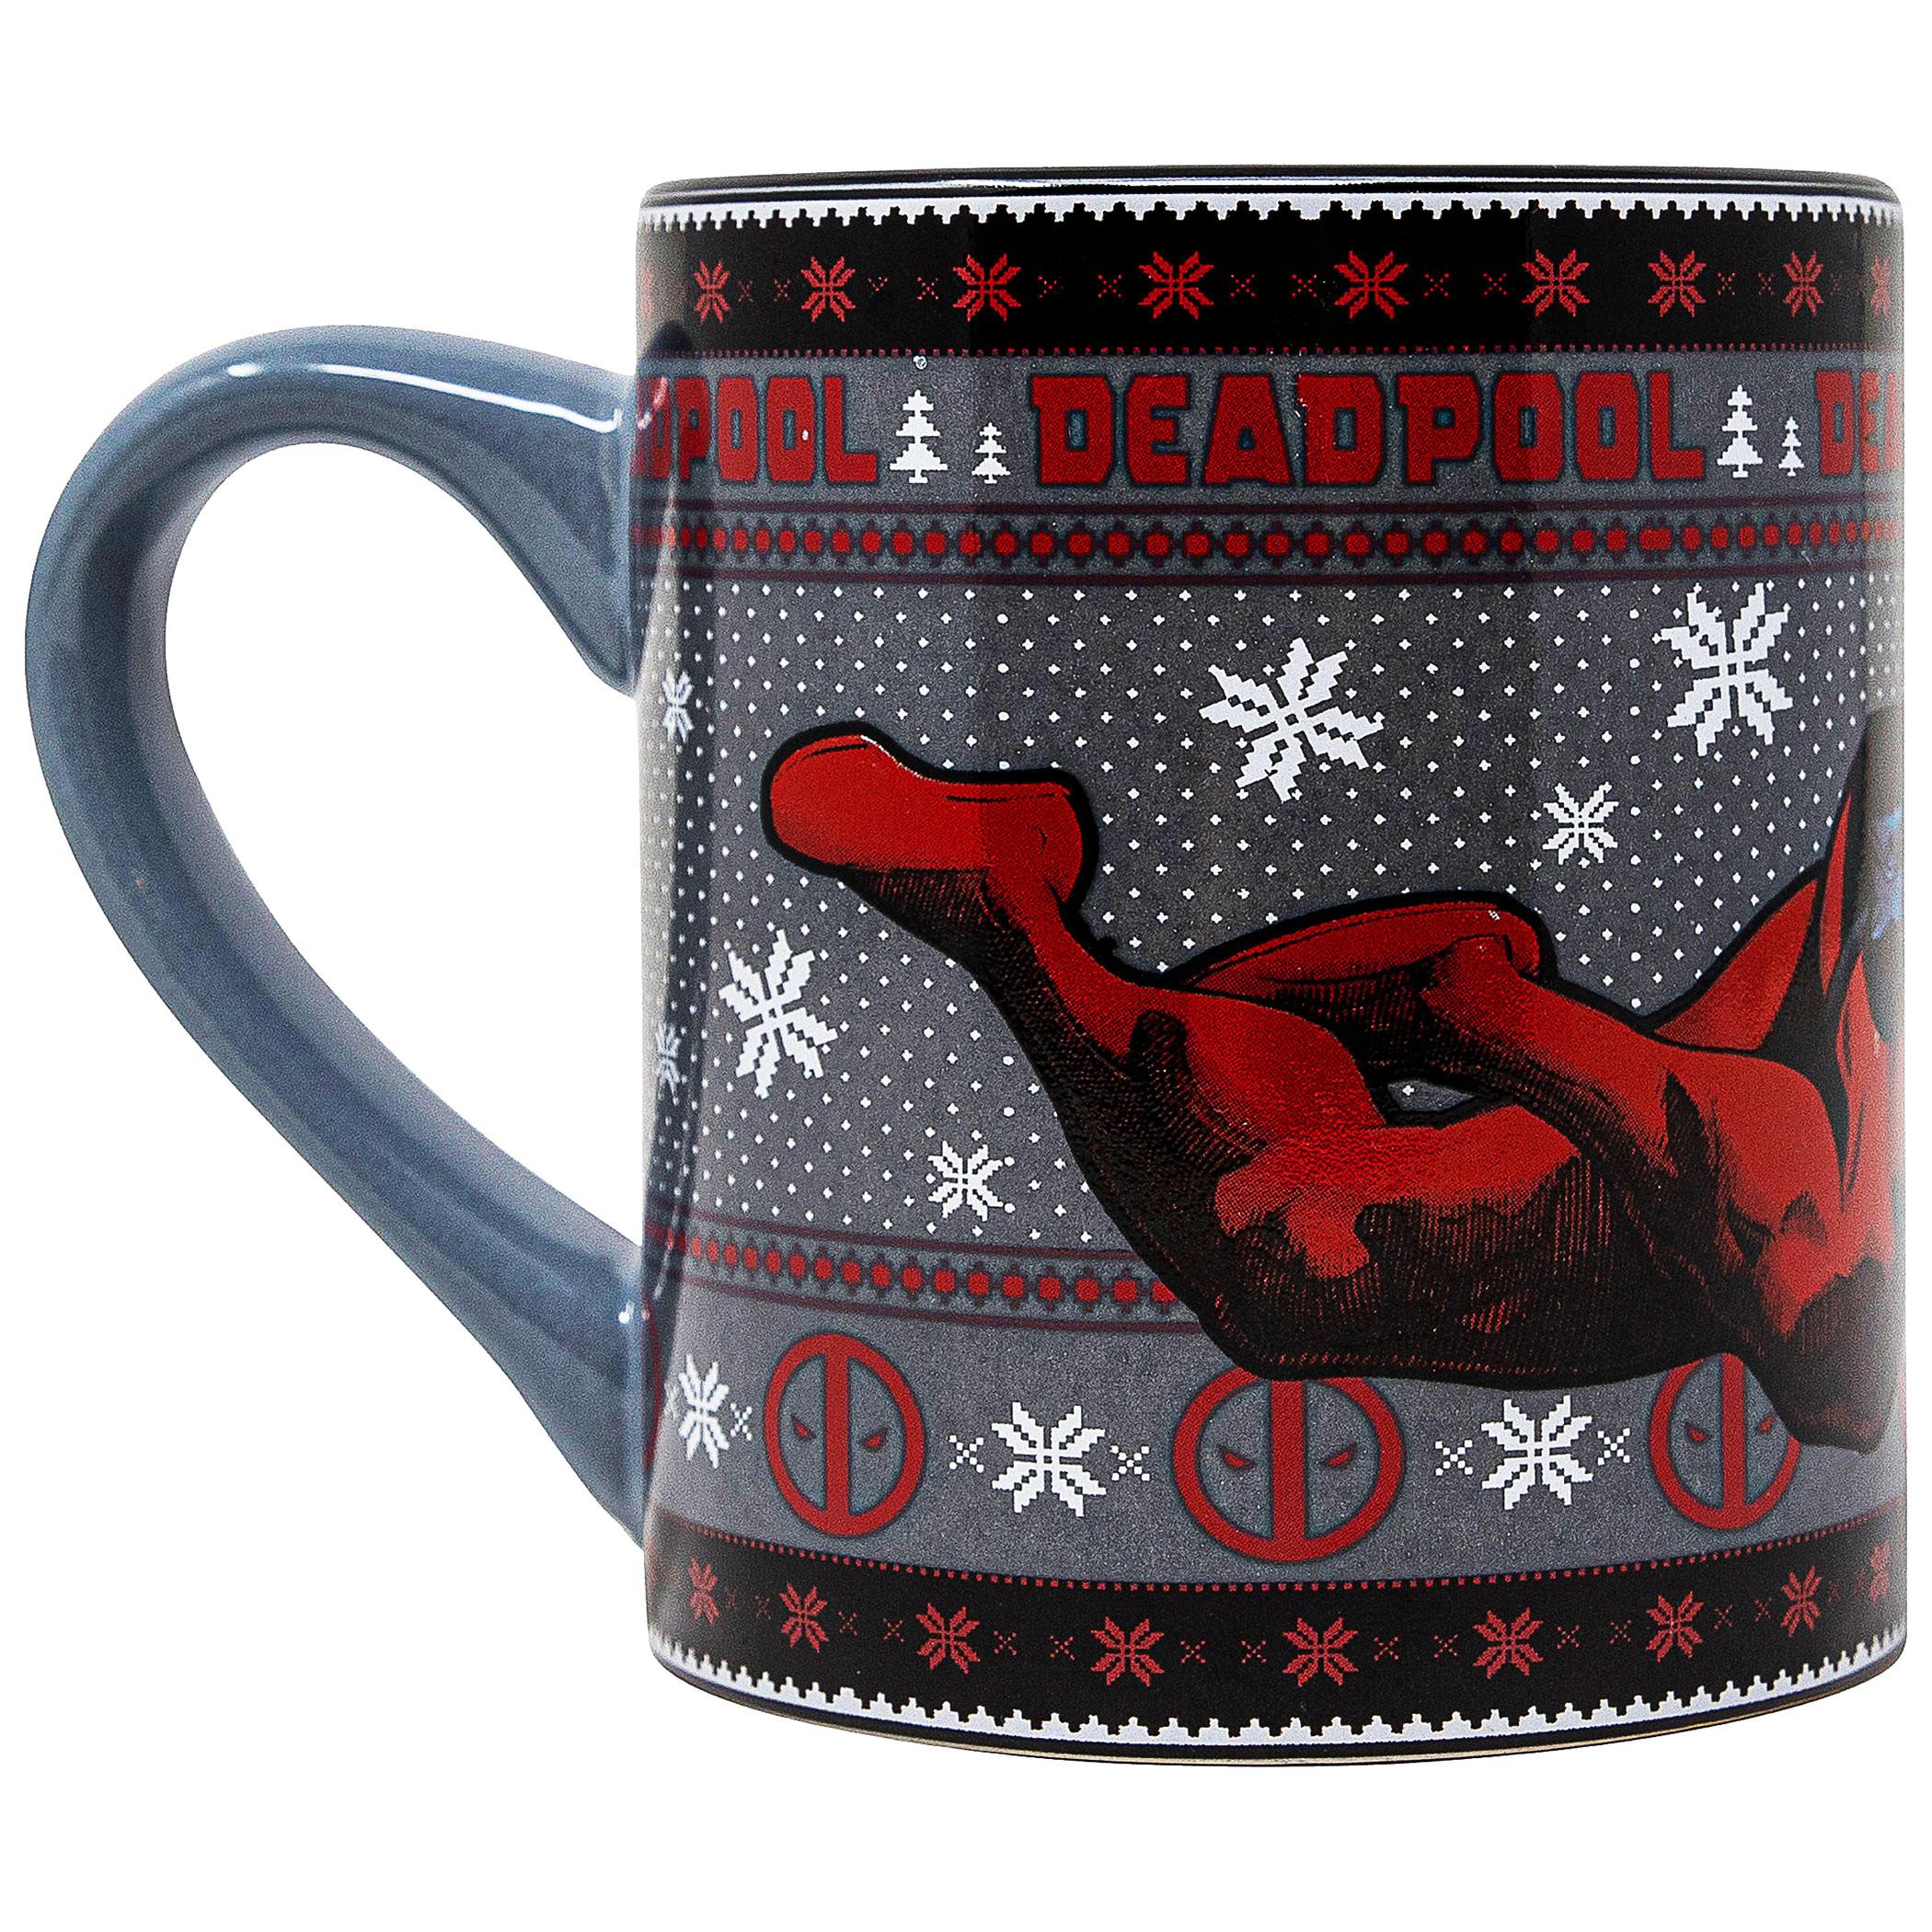 Deadpool Holiday Lounge 14 oz. Mug